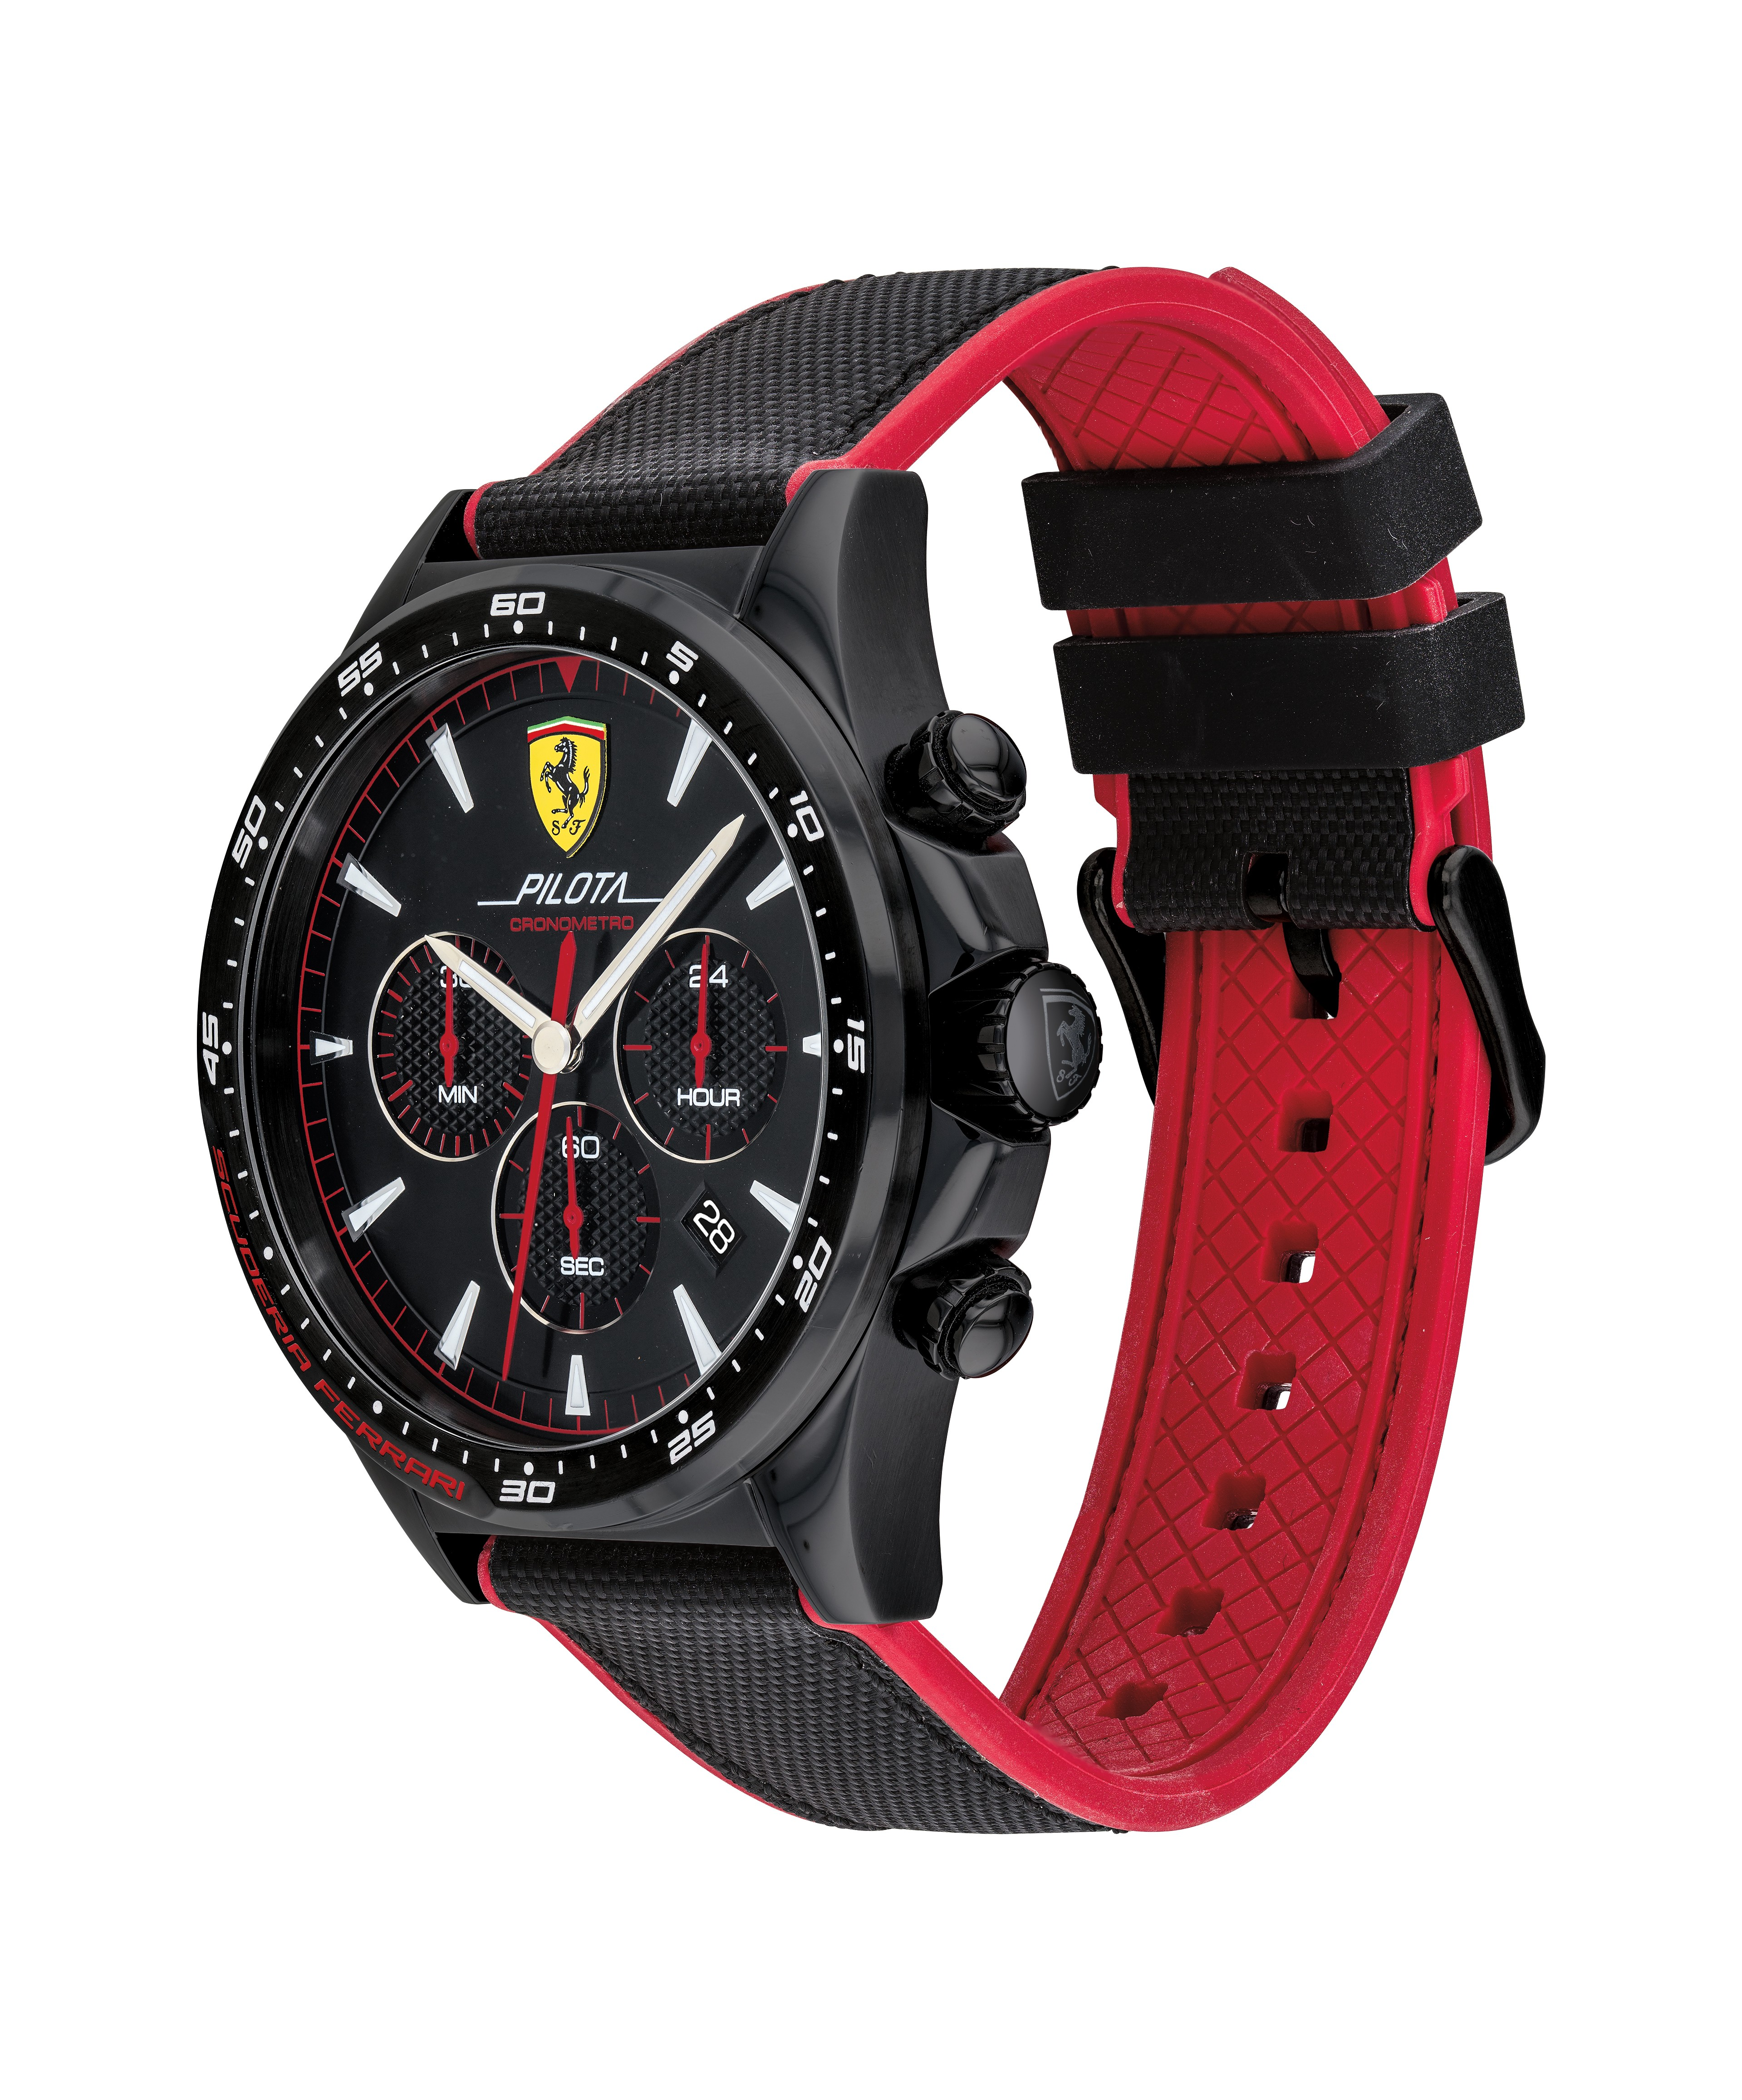 Ferrari 法拉利 Pilota 賽車手計時錶(0830623)